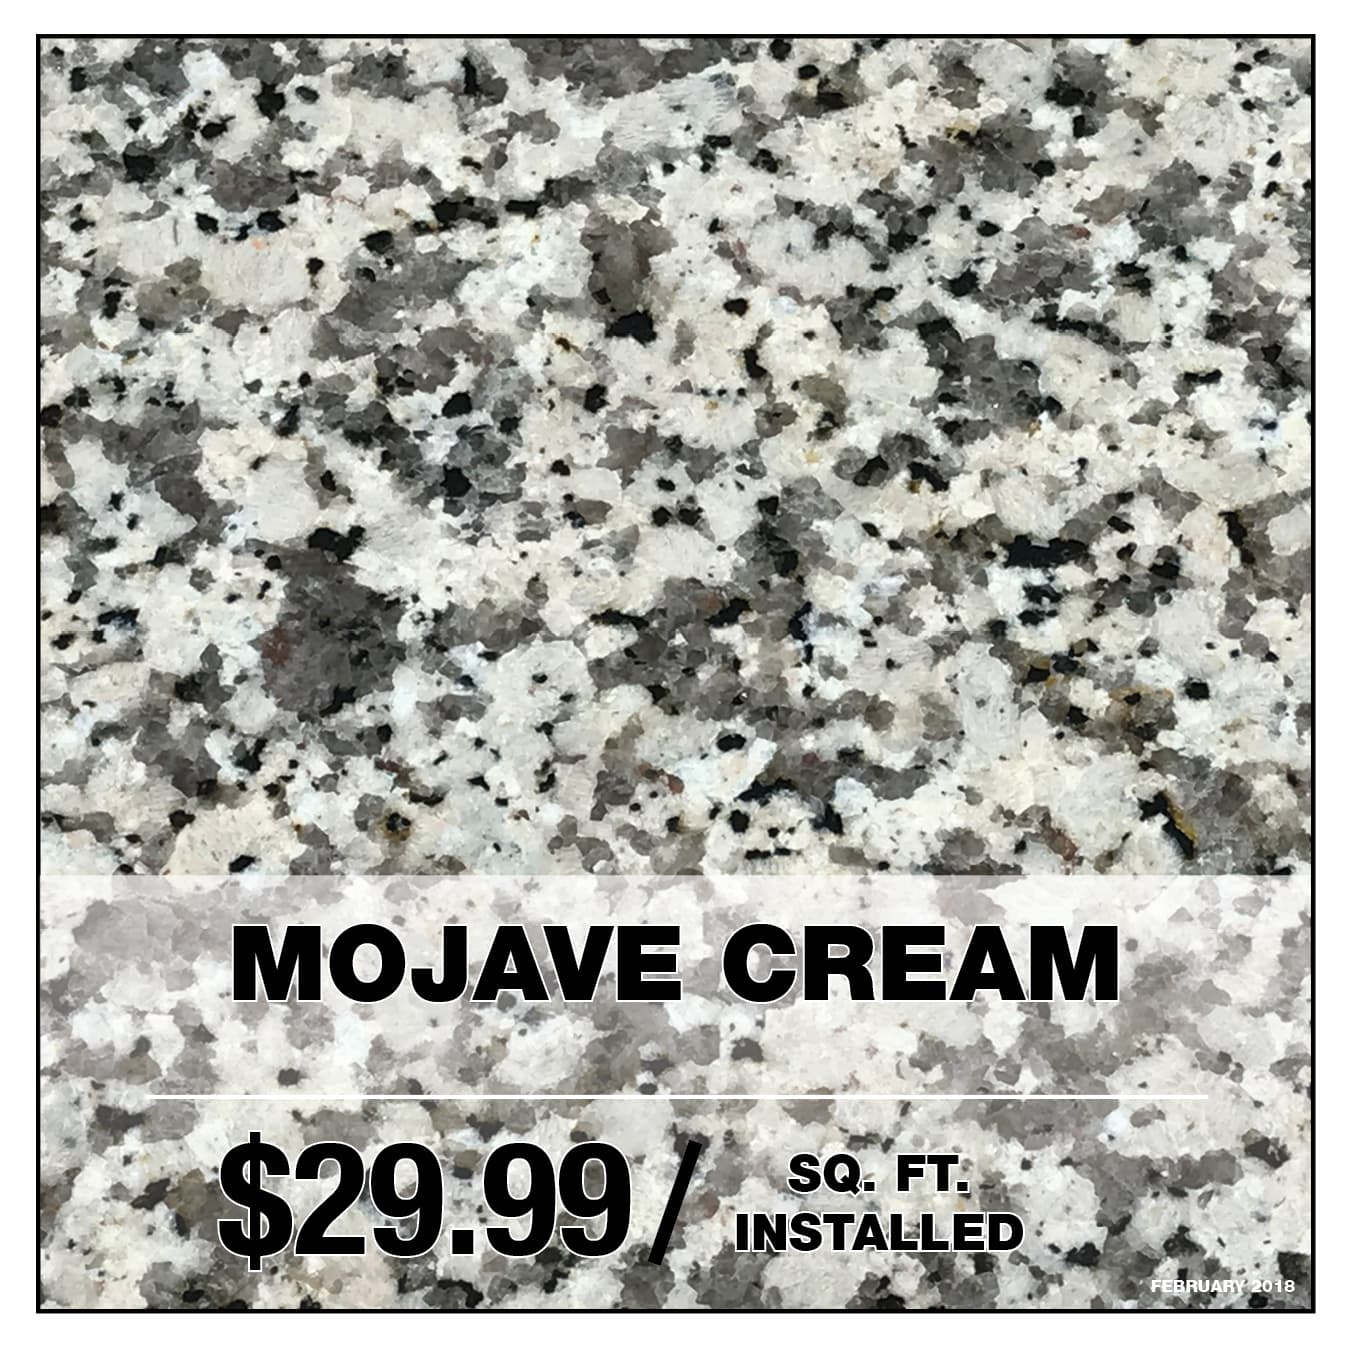 Mojave Cream